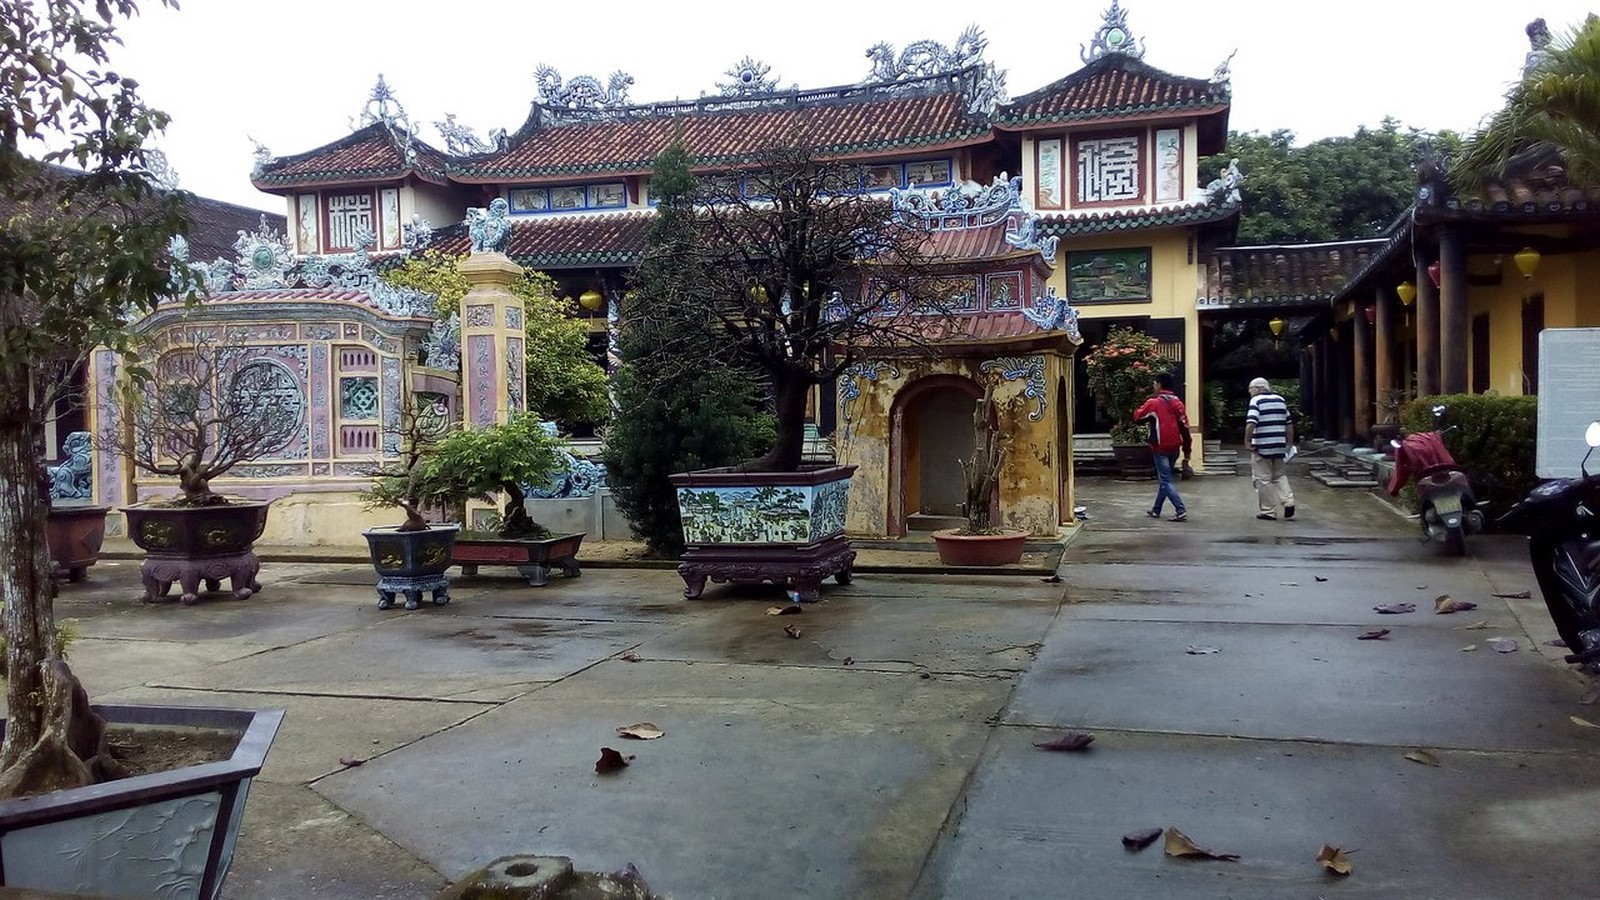 Phuoc Lam Pagoda In Vietnam - Sheet2